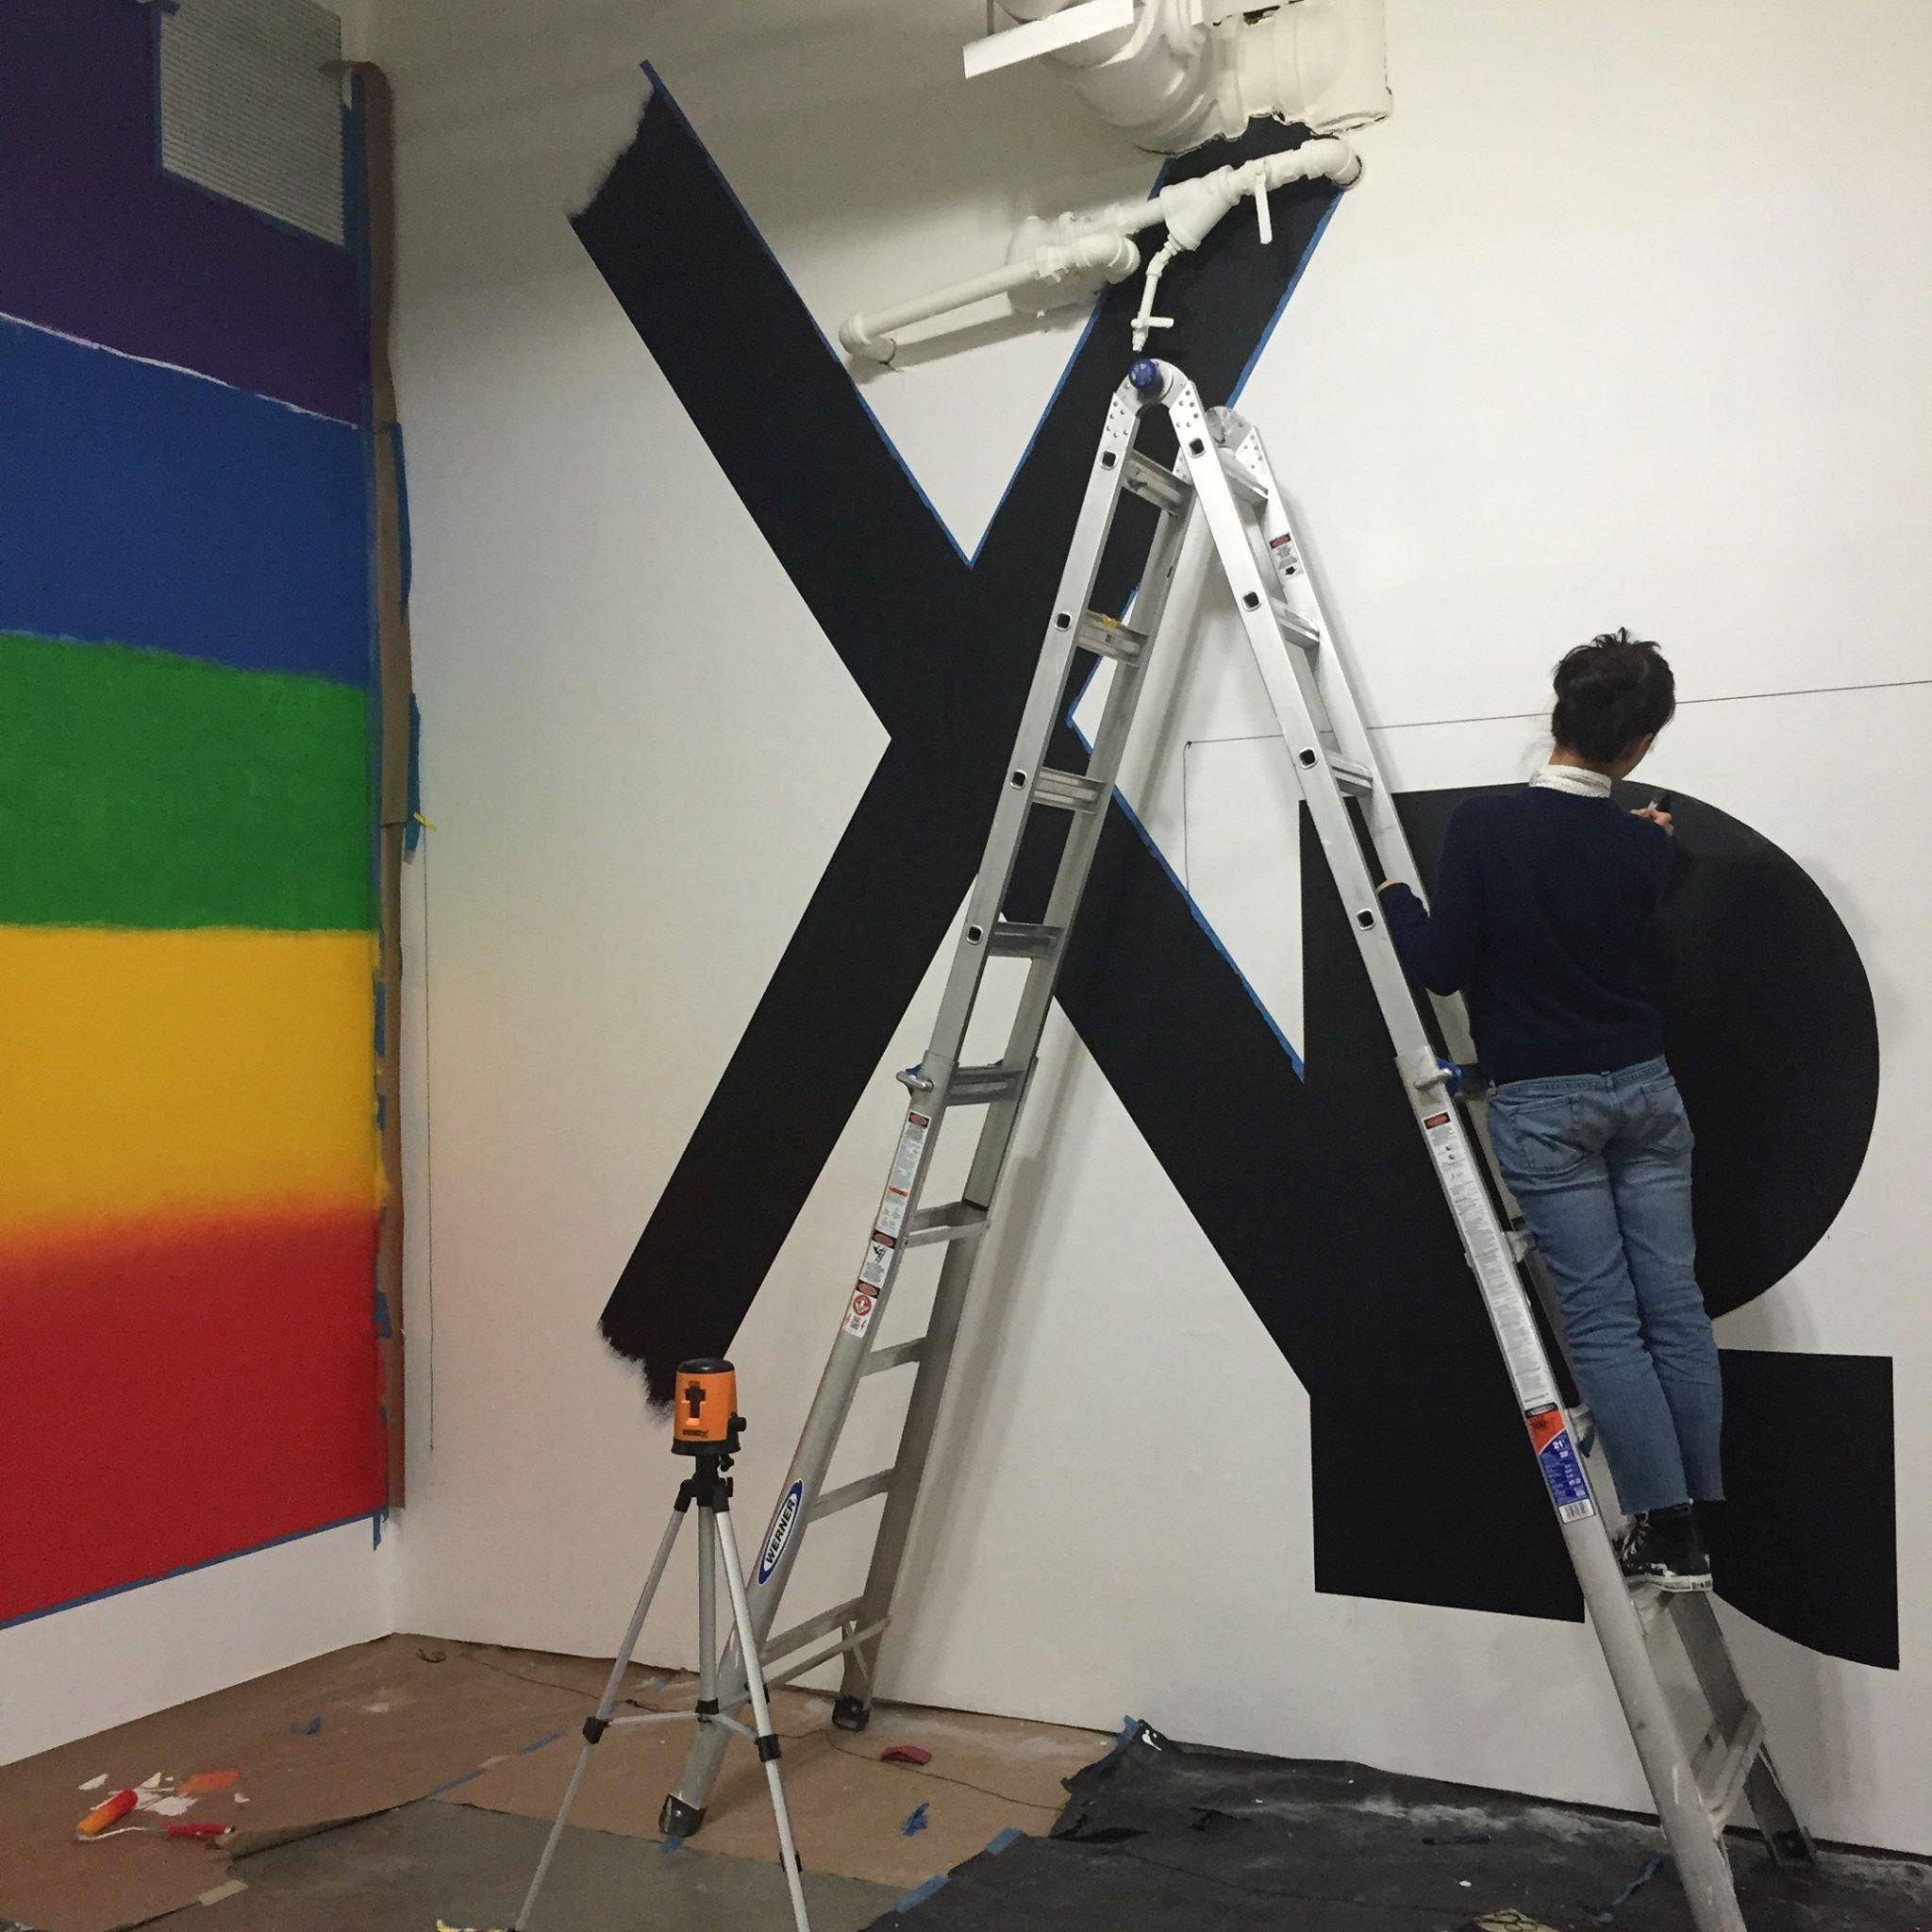 4 na kim wall graphic ladder on kim wall id=27741